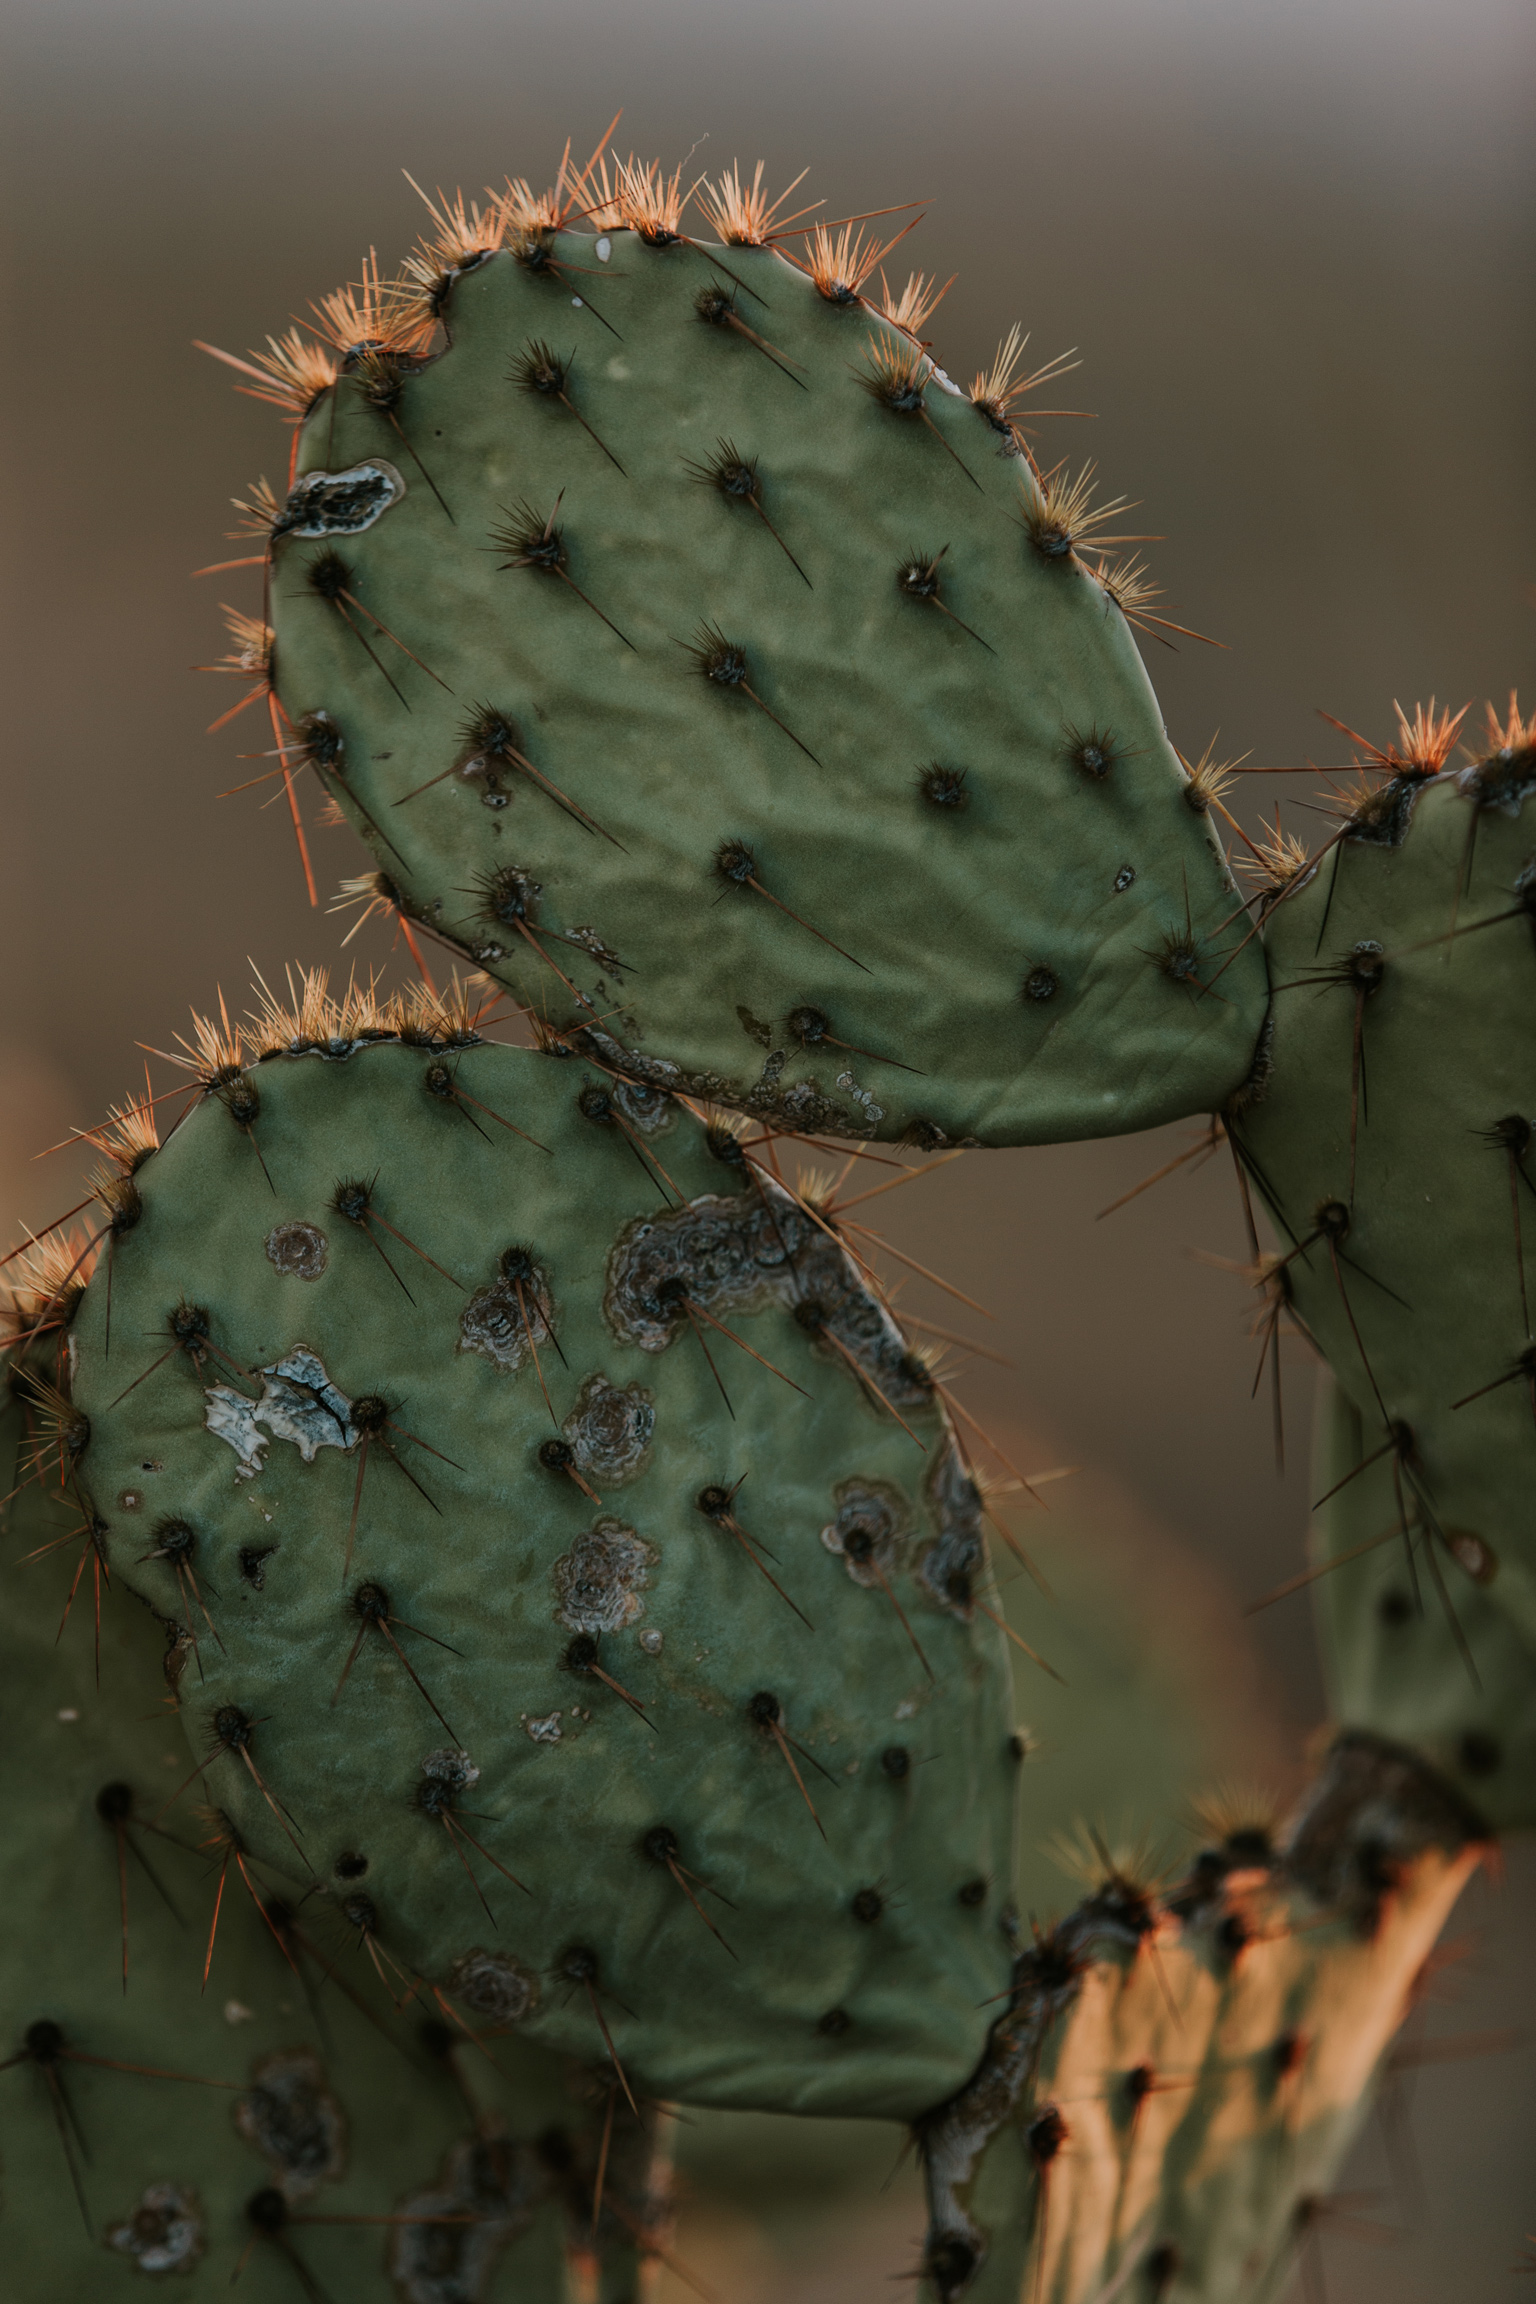 CindyGiovagnoli_Tucson_Arizona_Saguaro_National_Park_cactus_sunset_blooming_spring_sunset_petroglyphs_Native_American_indigenous-010.jpg